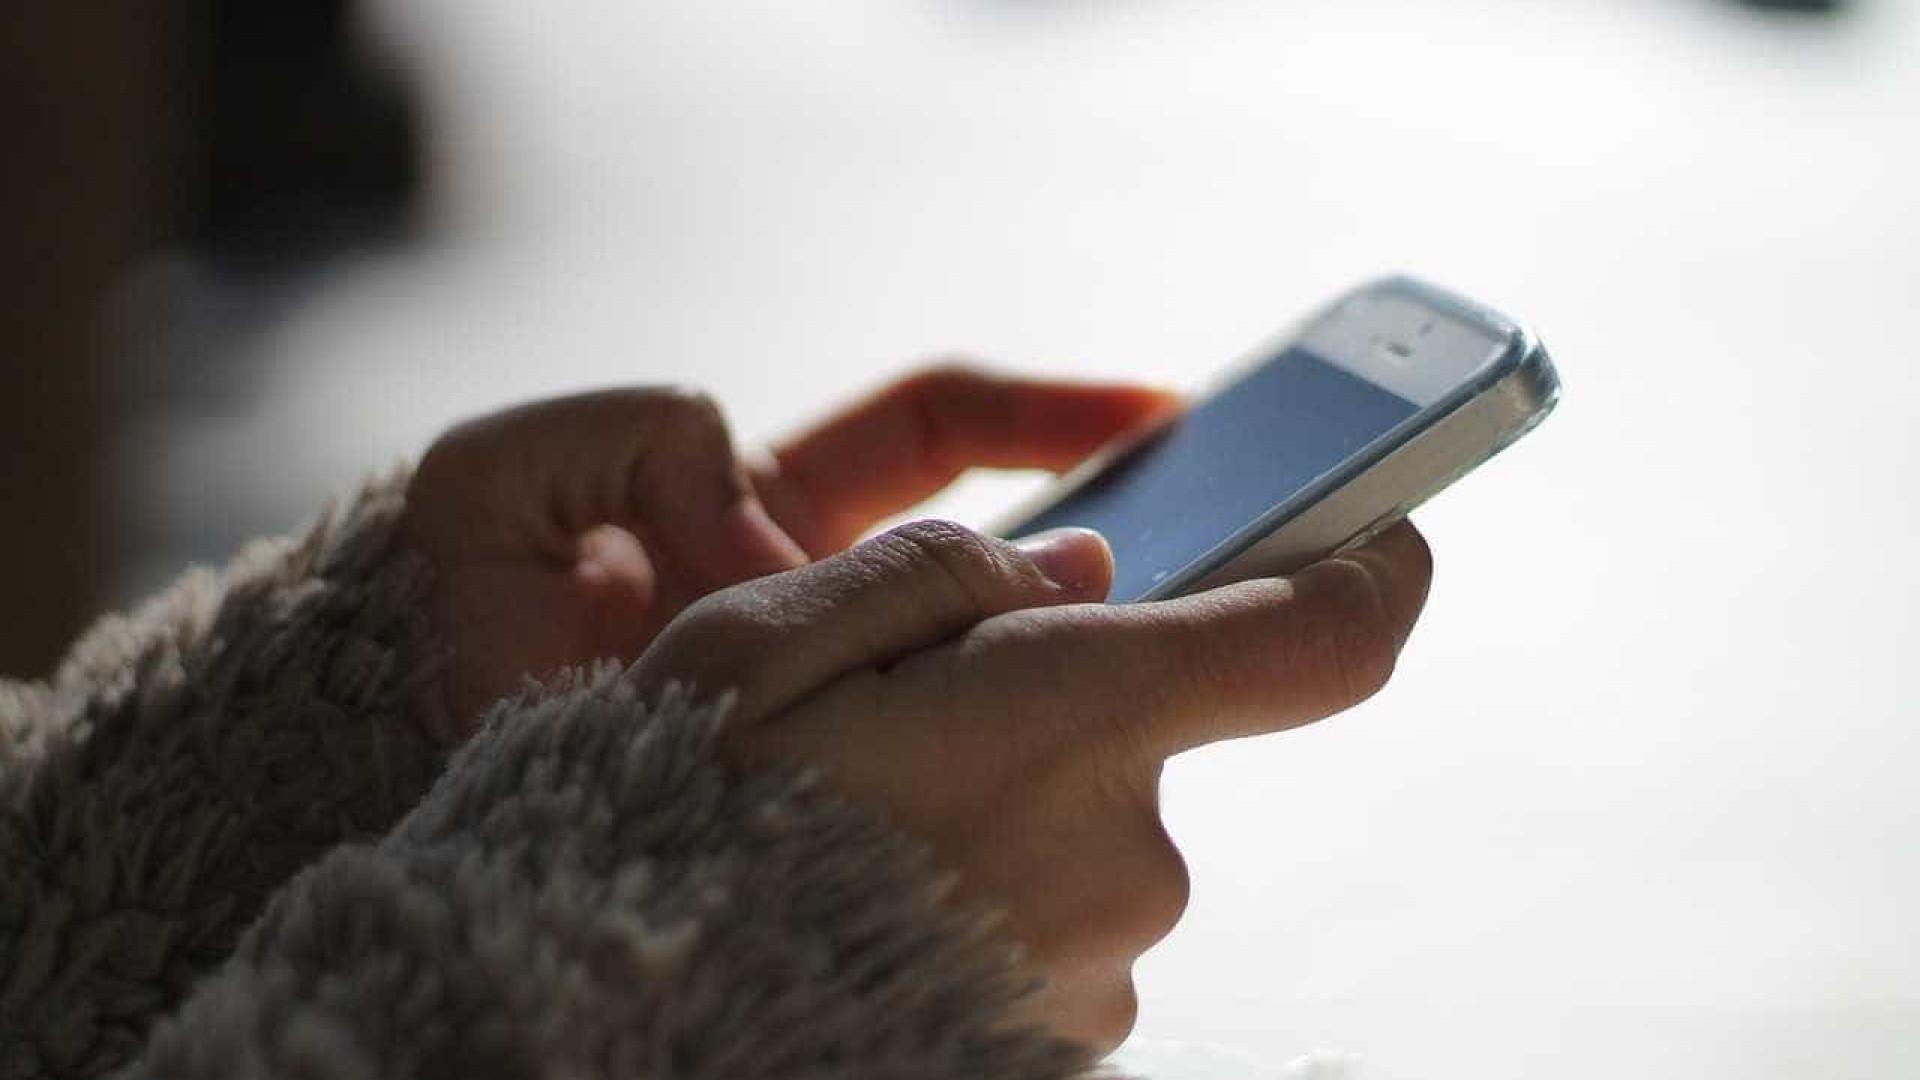 Vírus 'superpoderoso' está atacando celulares no Brasil; como evitar